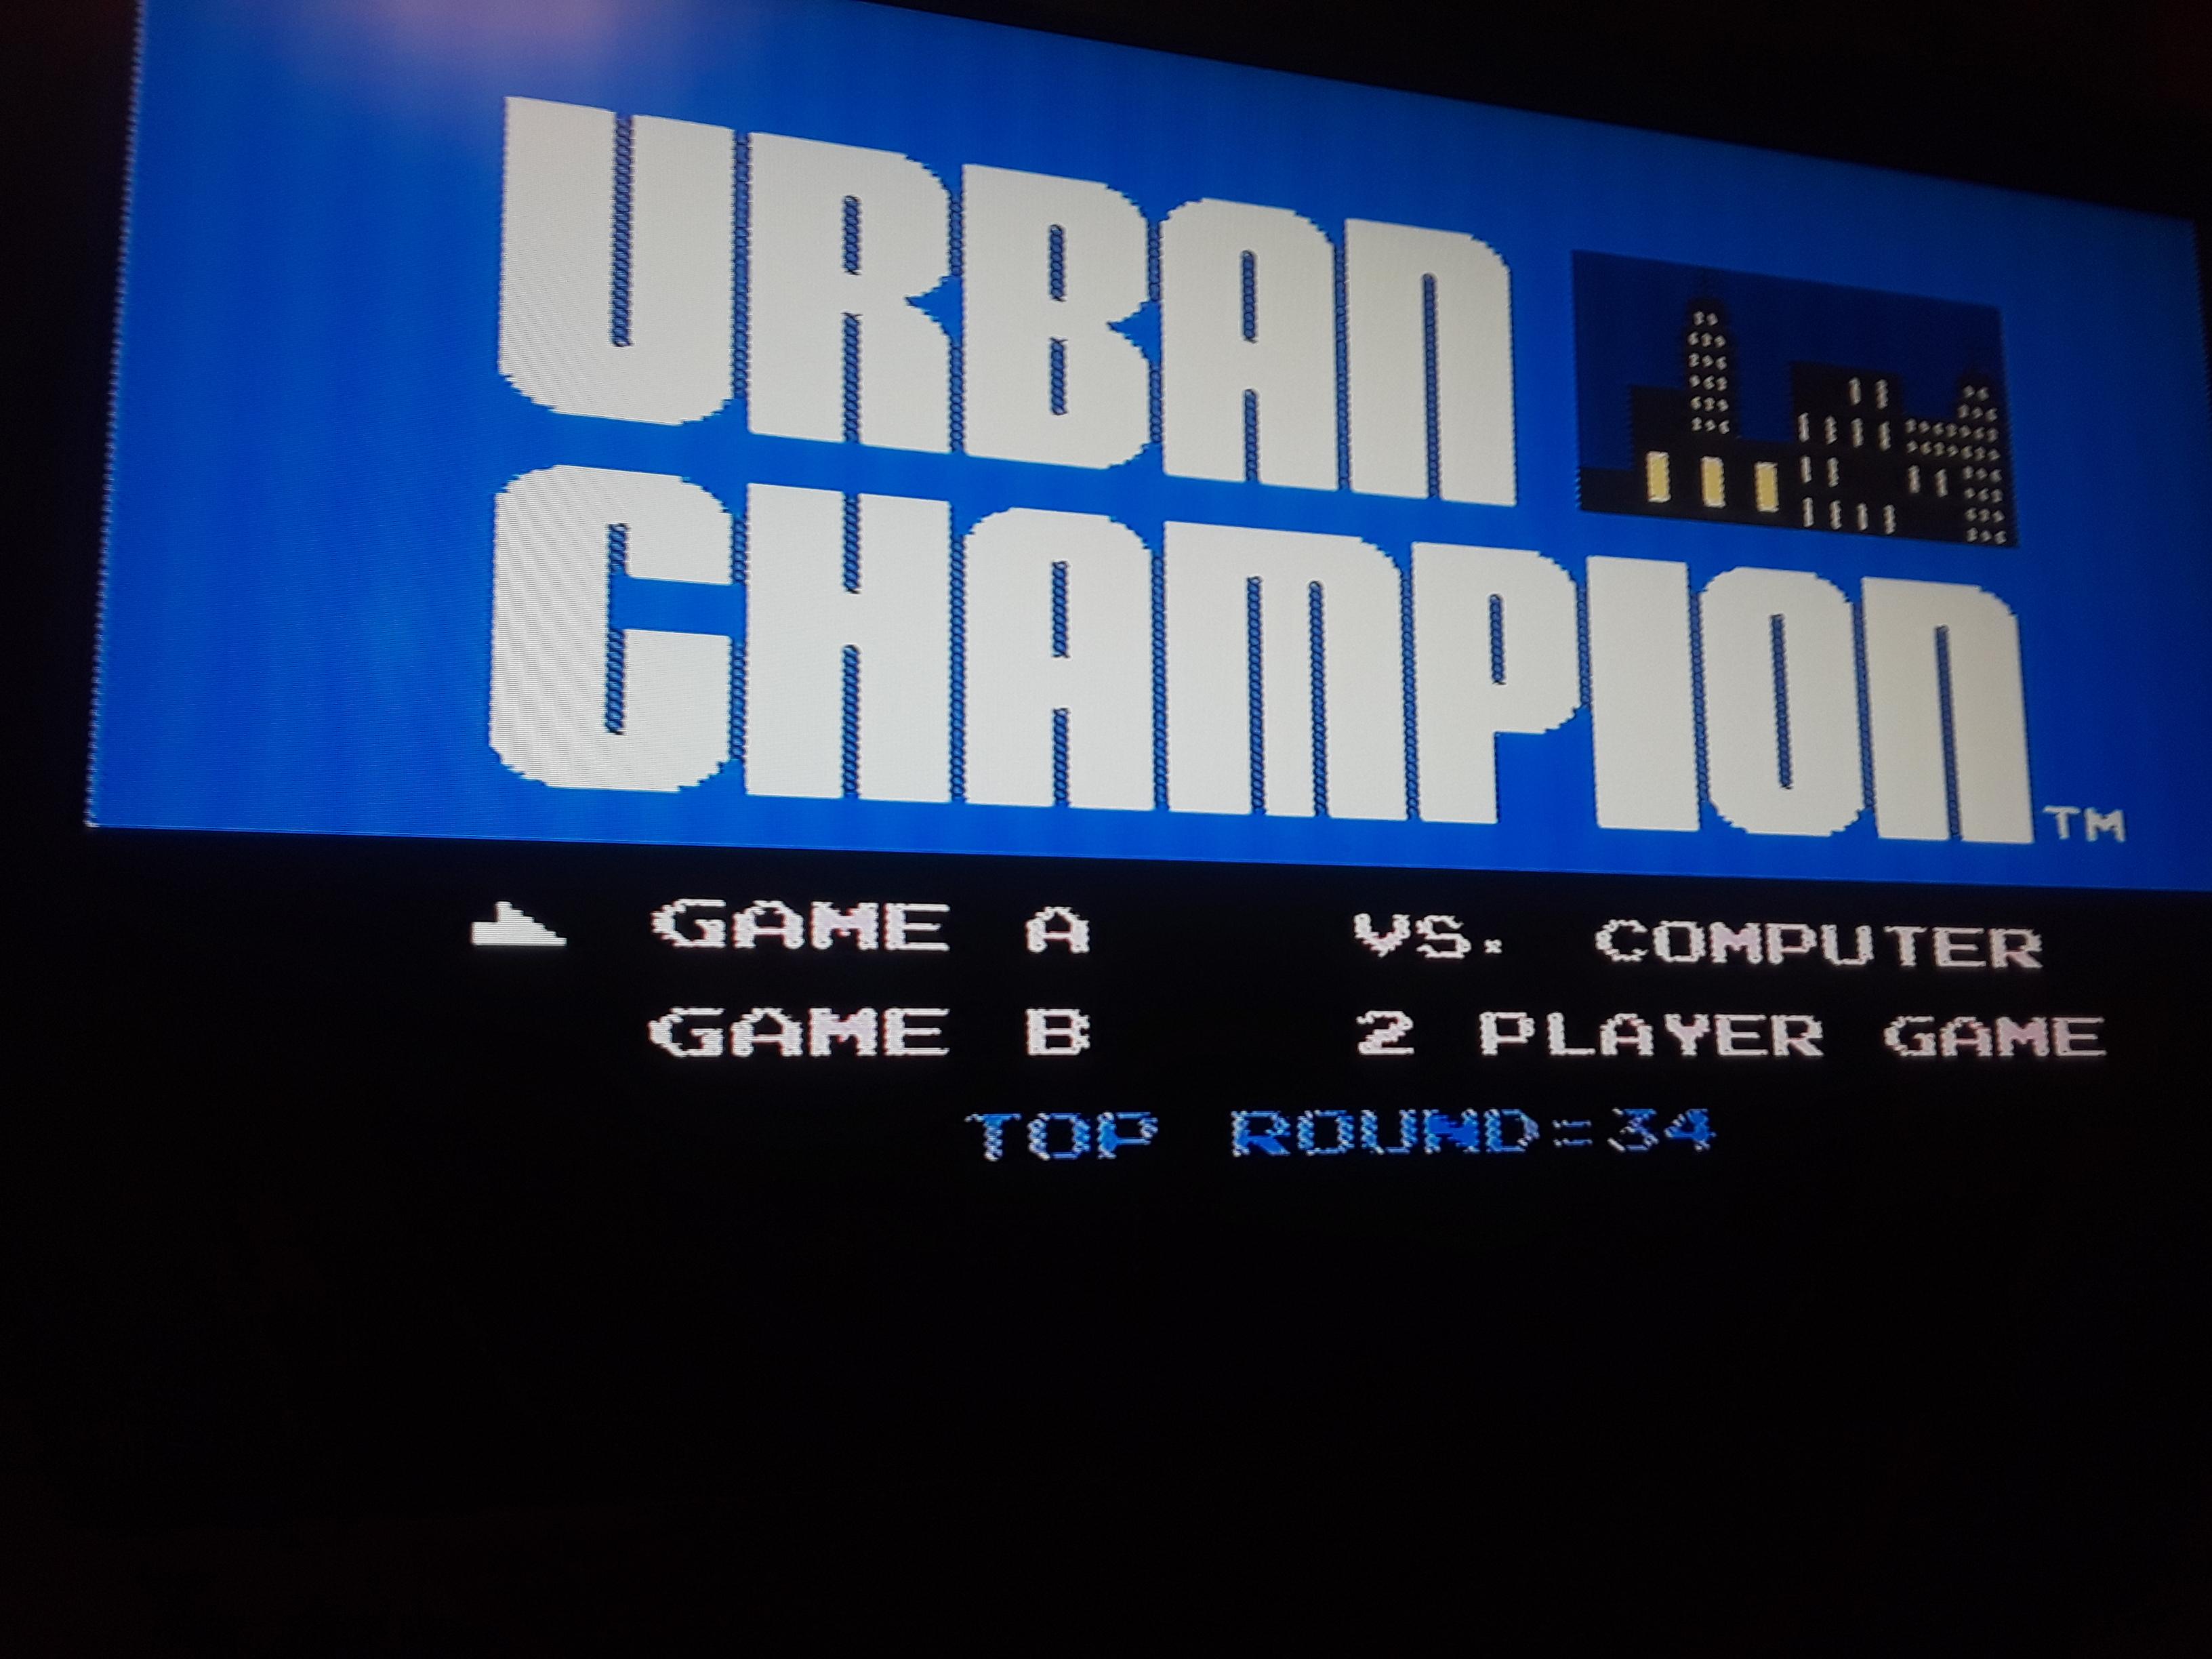 Urban Champion: Game A 34 points